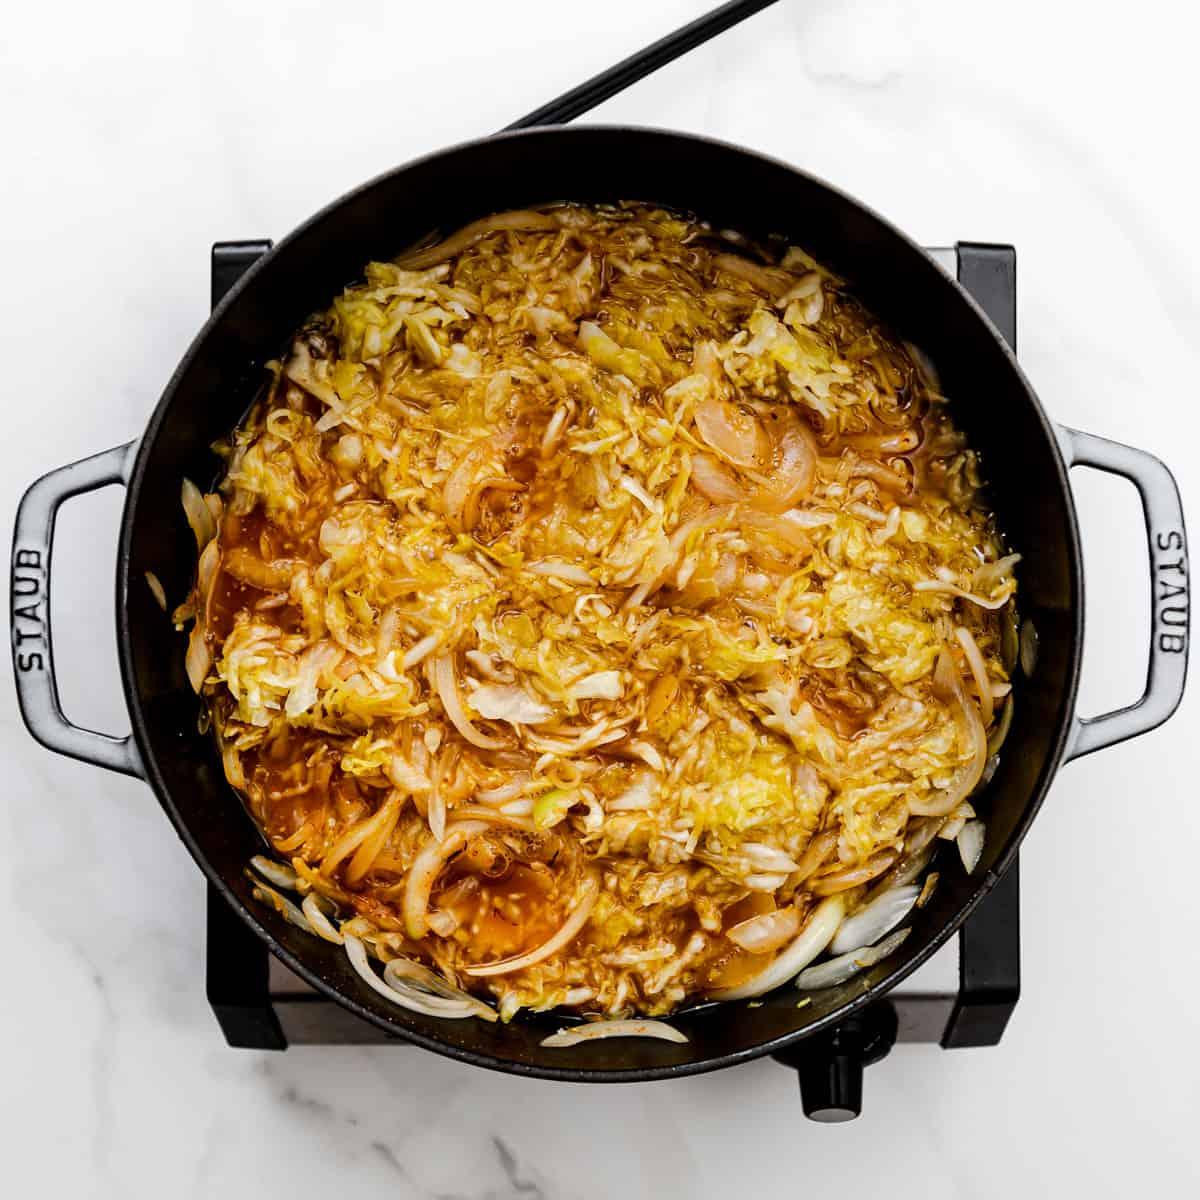 braising sausages with onion and sauerkraut.